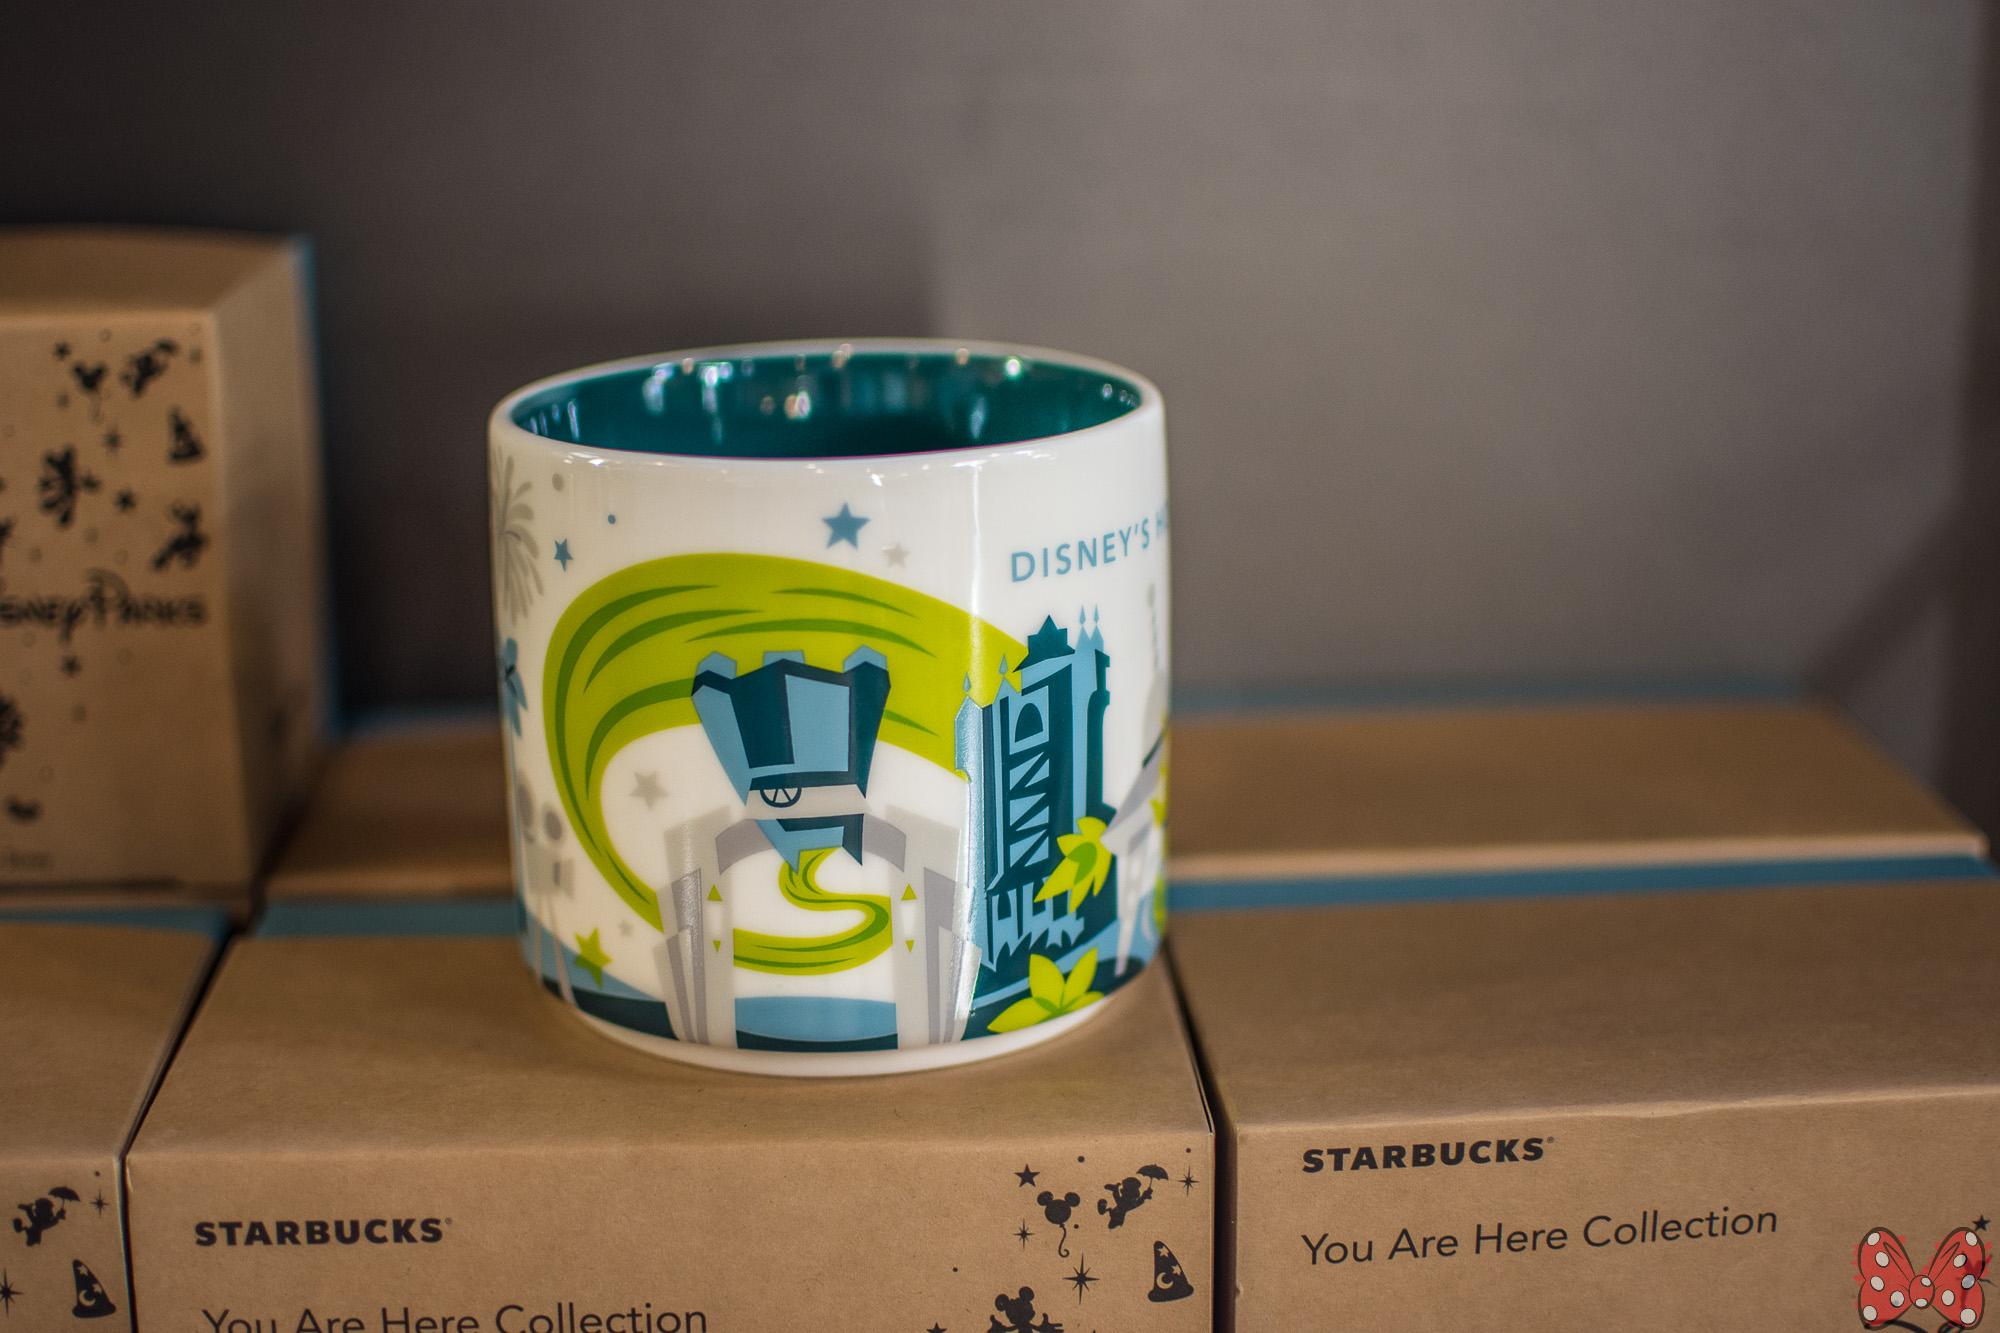 New Studios Starbucks Hollywood Hollywood New Starbucks New Studios Studios Hollywood Starbucks dxWrBoCe